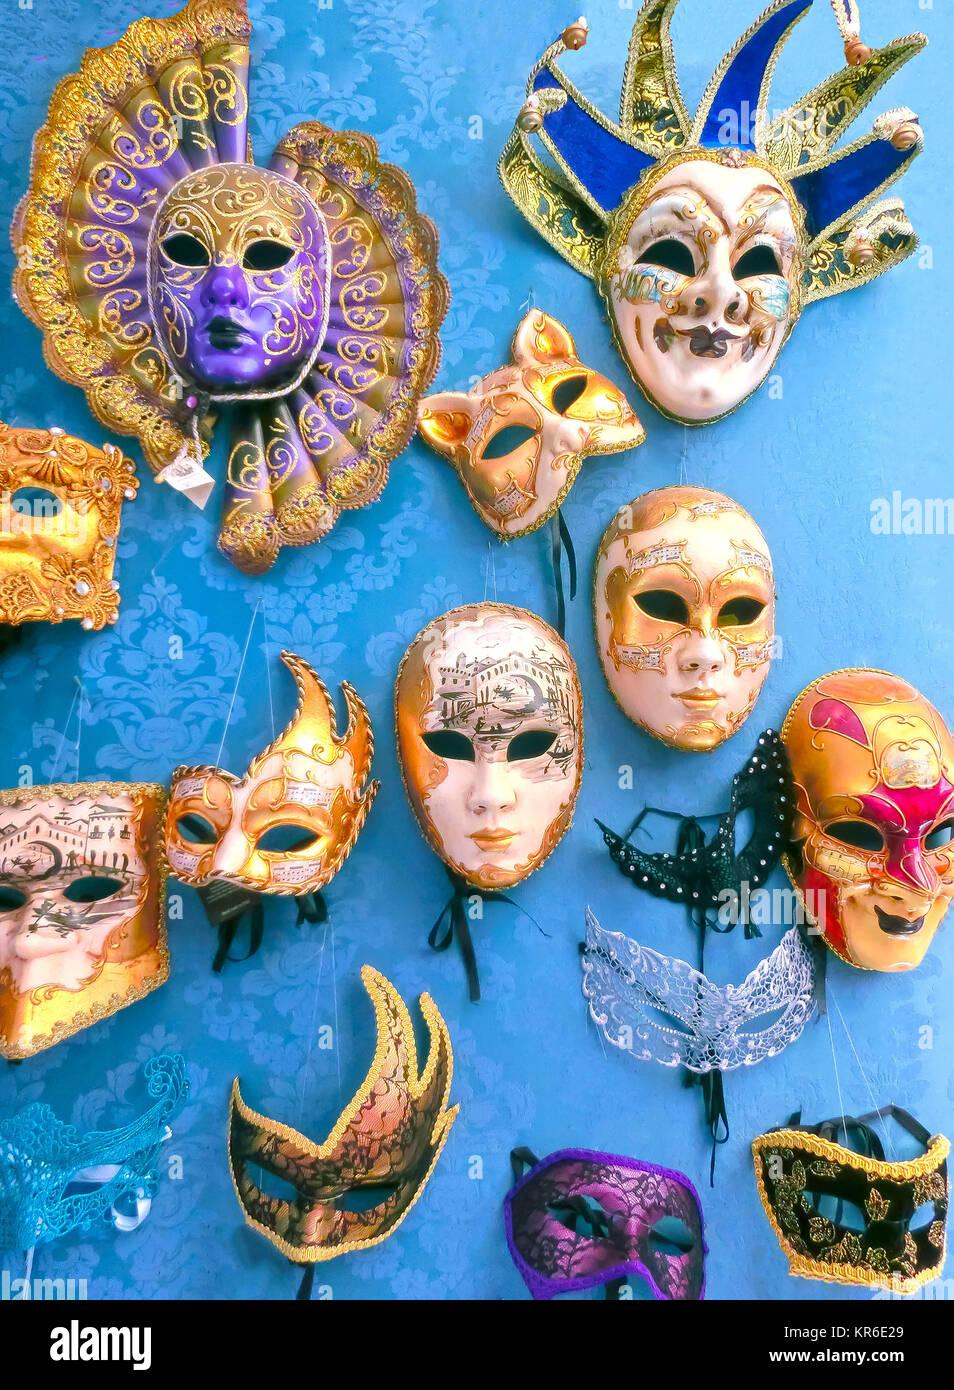 Venice, Italy - May 10, 2014: Venetian carnival masks, souvenir shop on a street - Stock Image